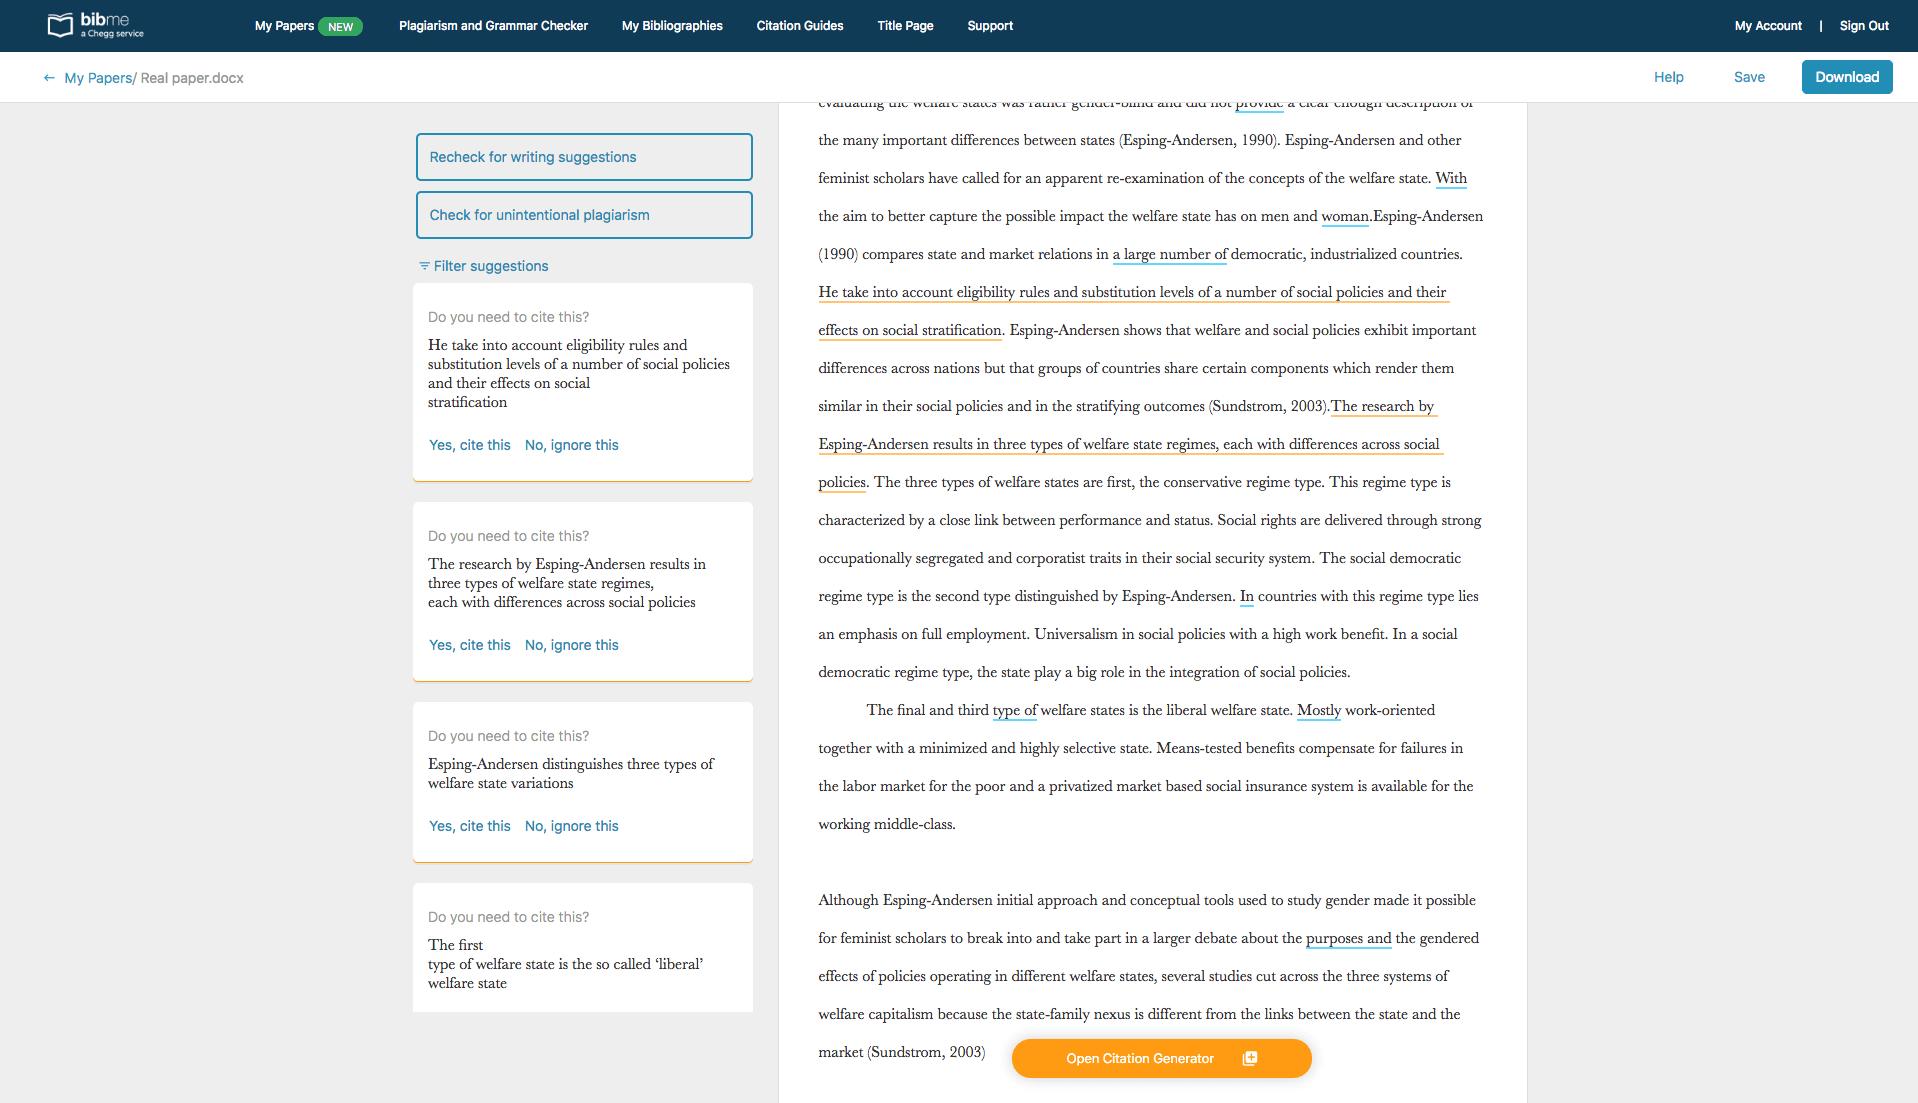 BibMe Plagiarism Checker report